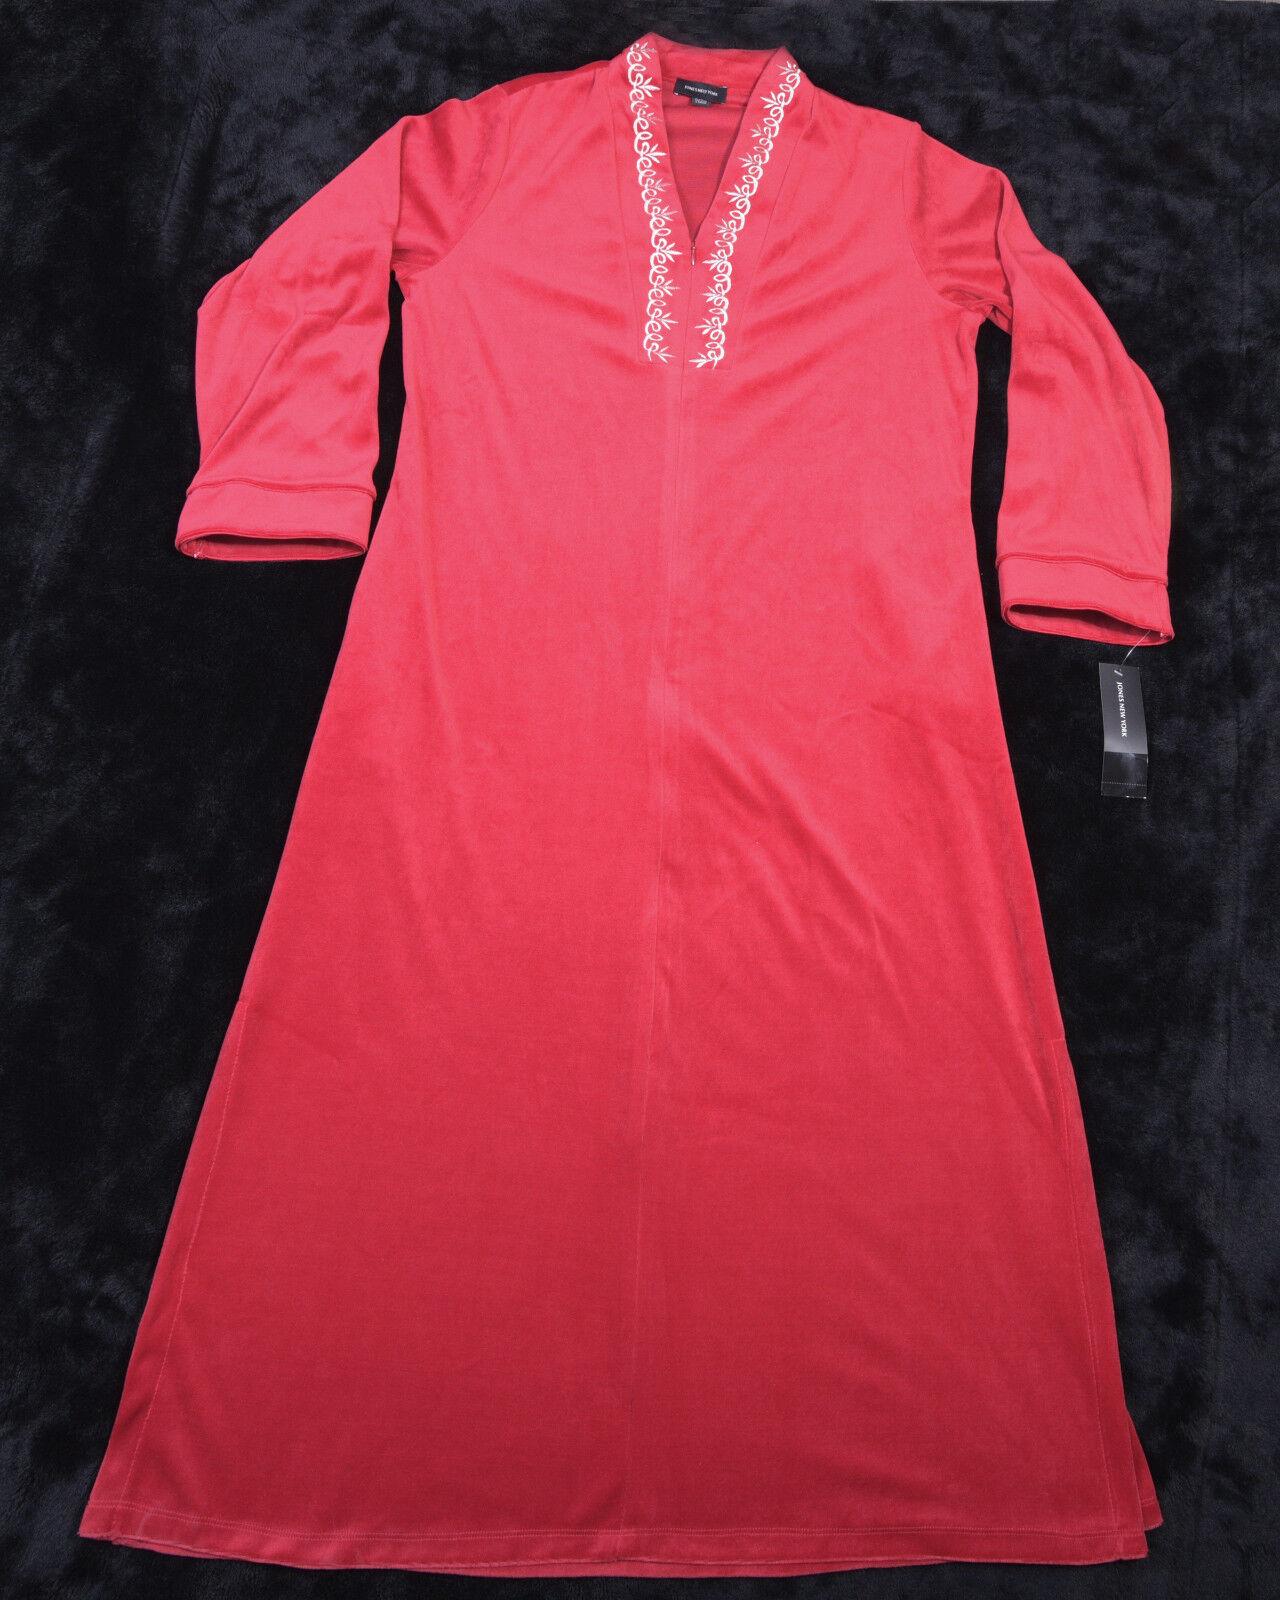 JONES NEW YORK Womens 1 2 Zip SLEEPWEAR HOUSECOAT ROBE Size LARGE L Red NWT NEW